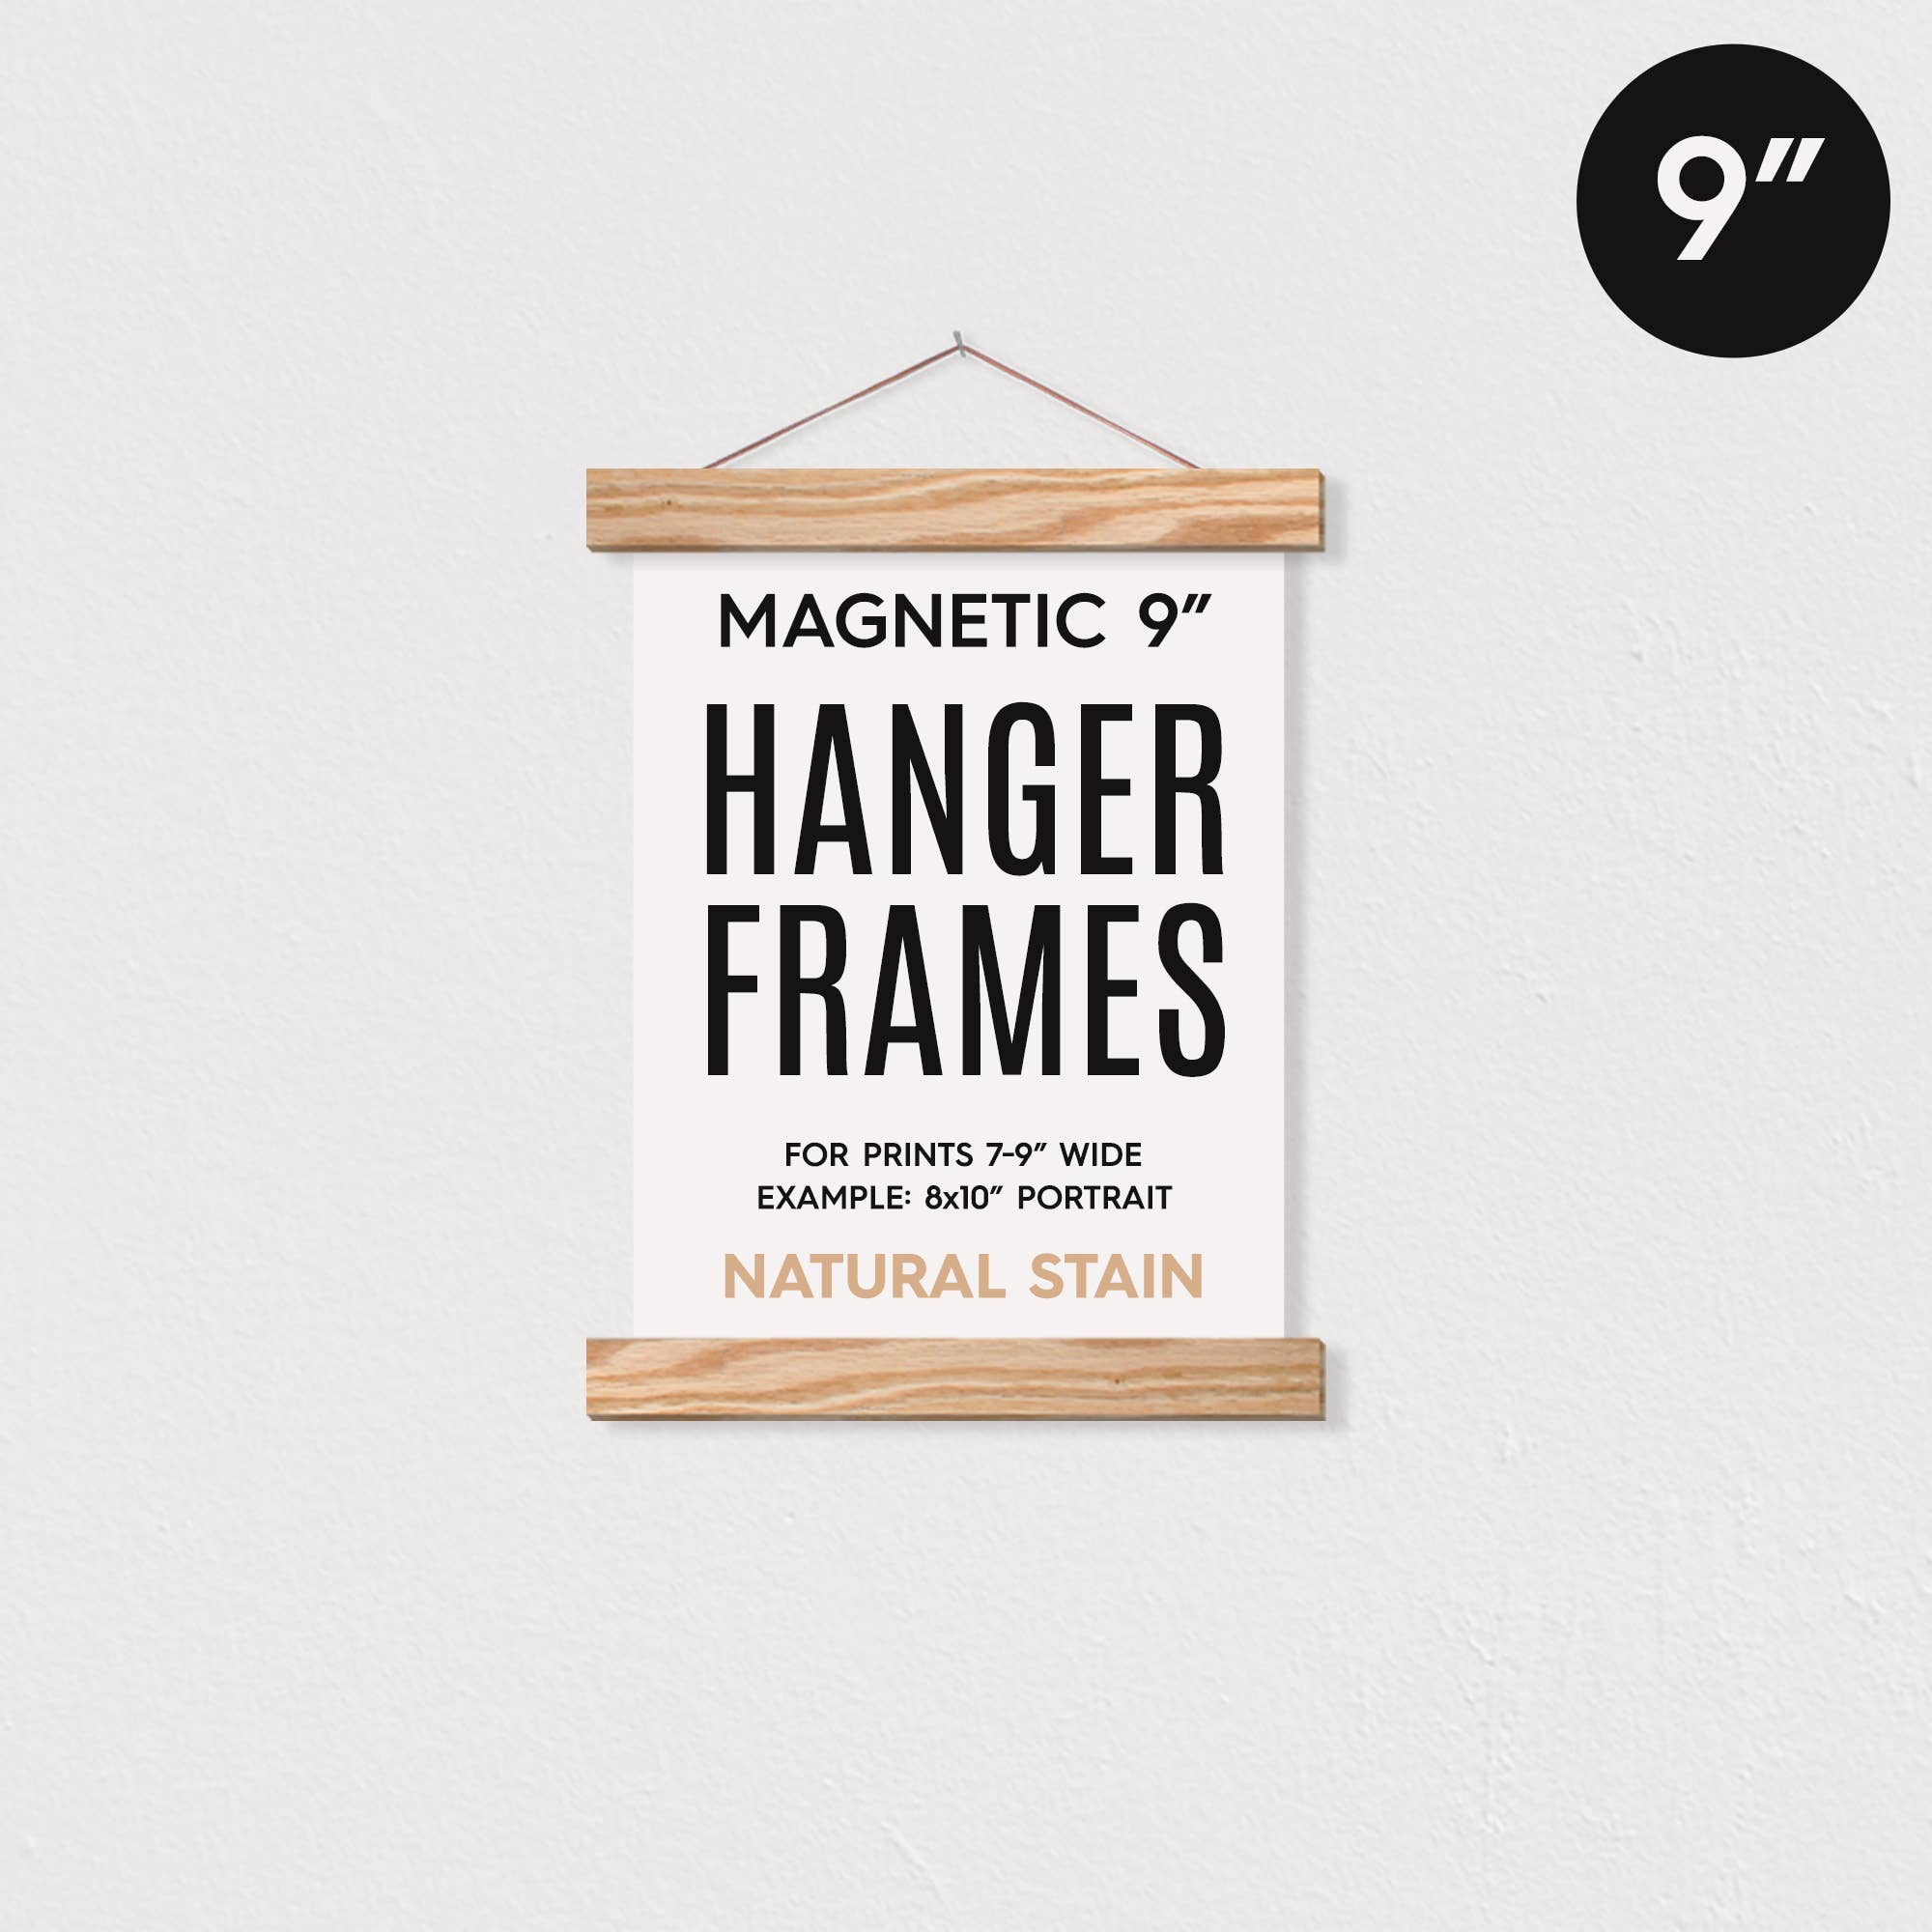 "9"" MAGNETIC Poster Hanger Frame for 8x10"" Portrait Prints   Trada Marketplace"